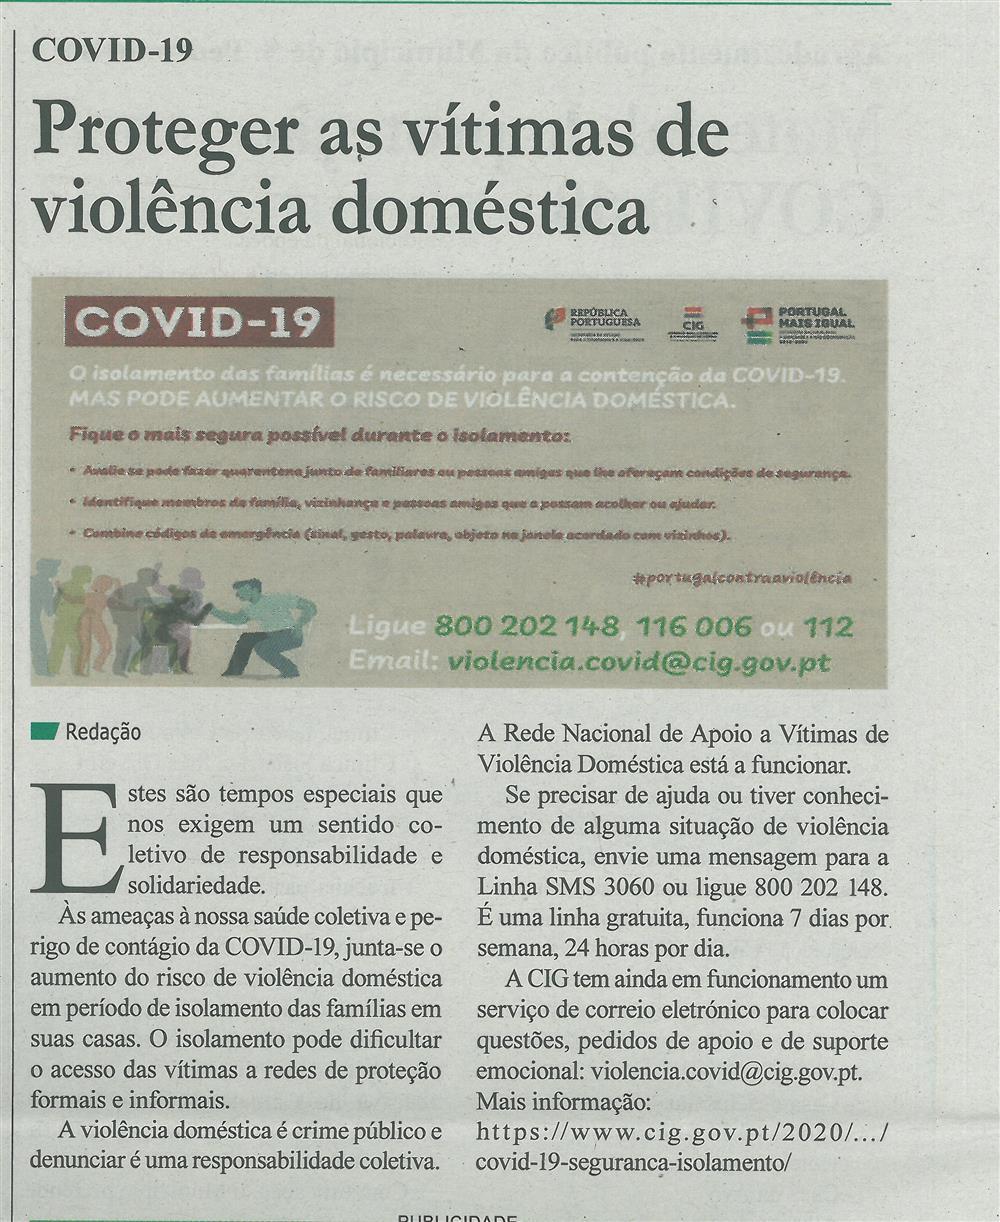 GB-16abr.'20-p.3-Proteger as vítimas de violência doméstica : covid-19.jpg